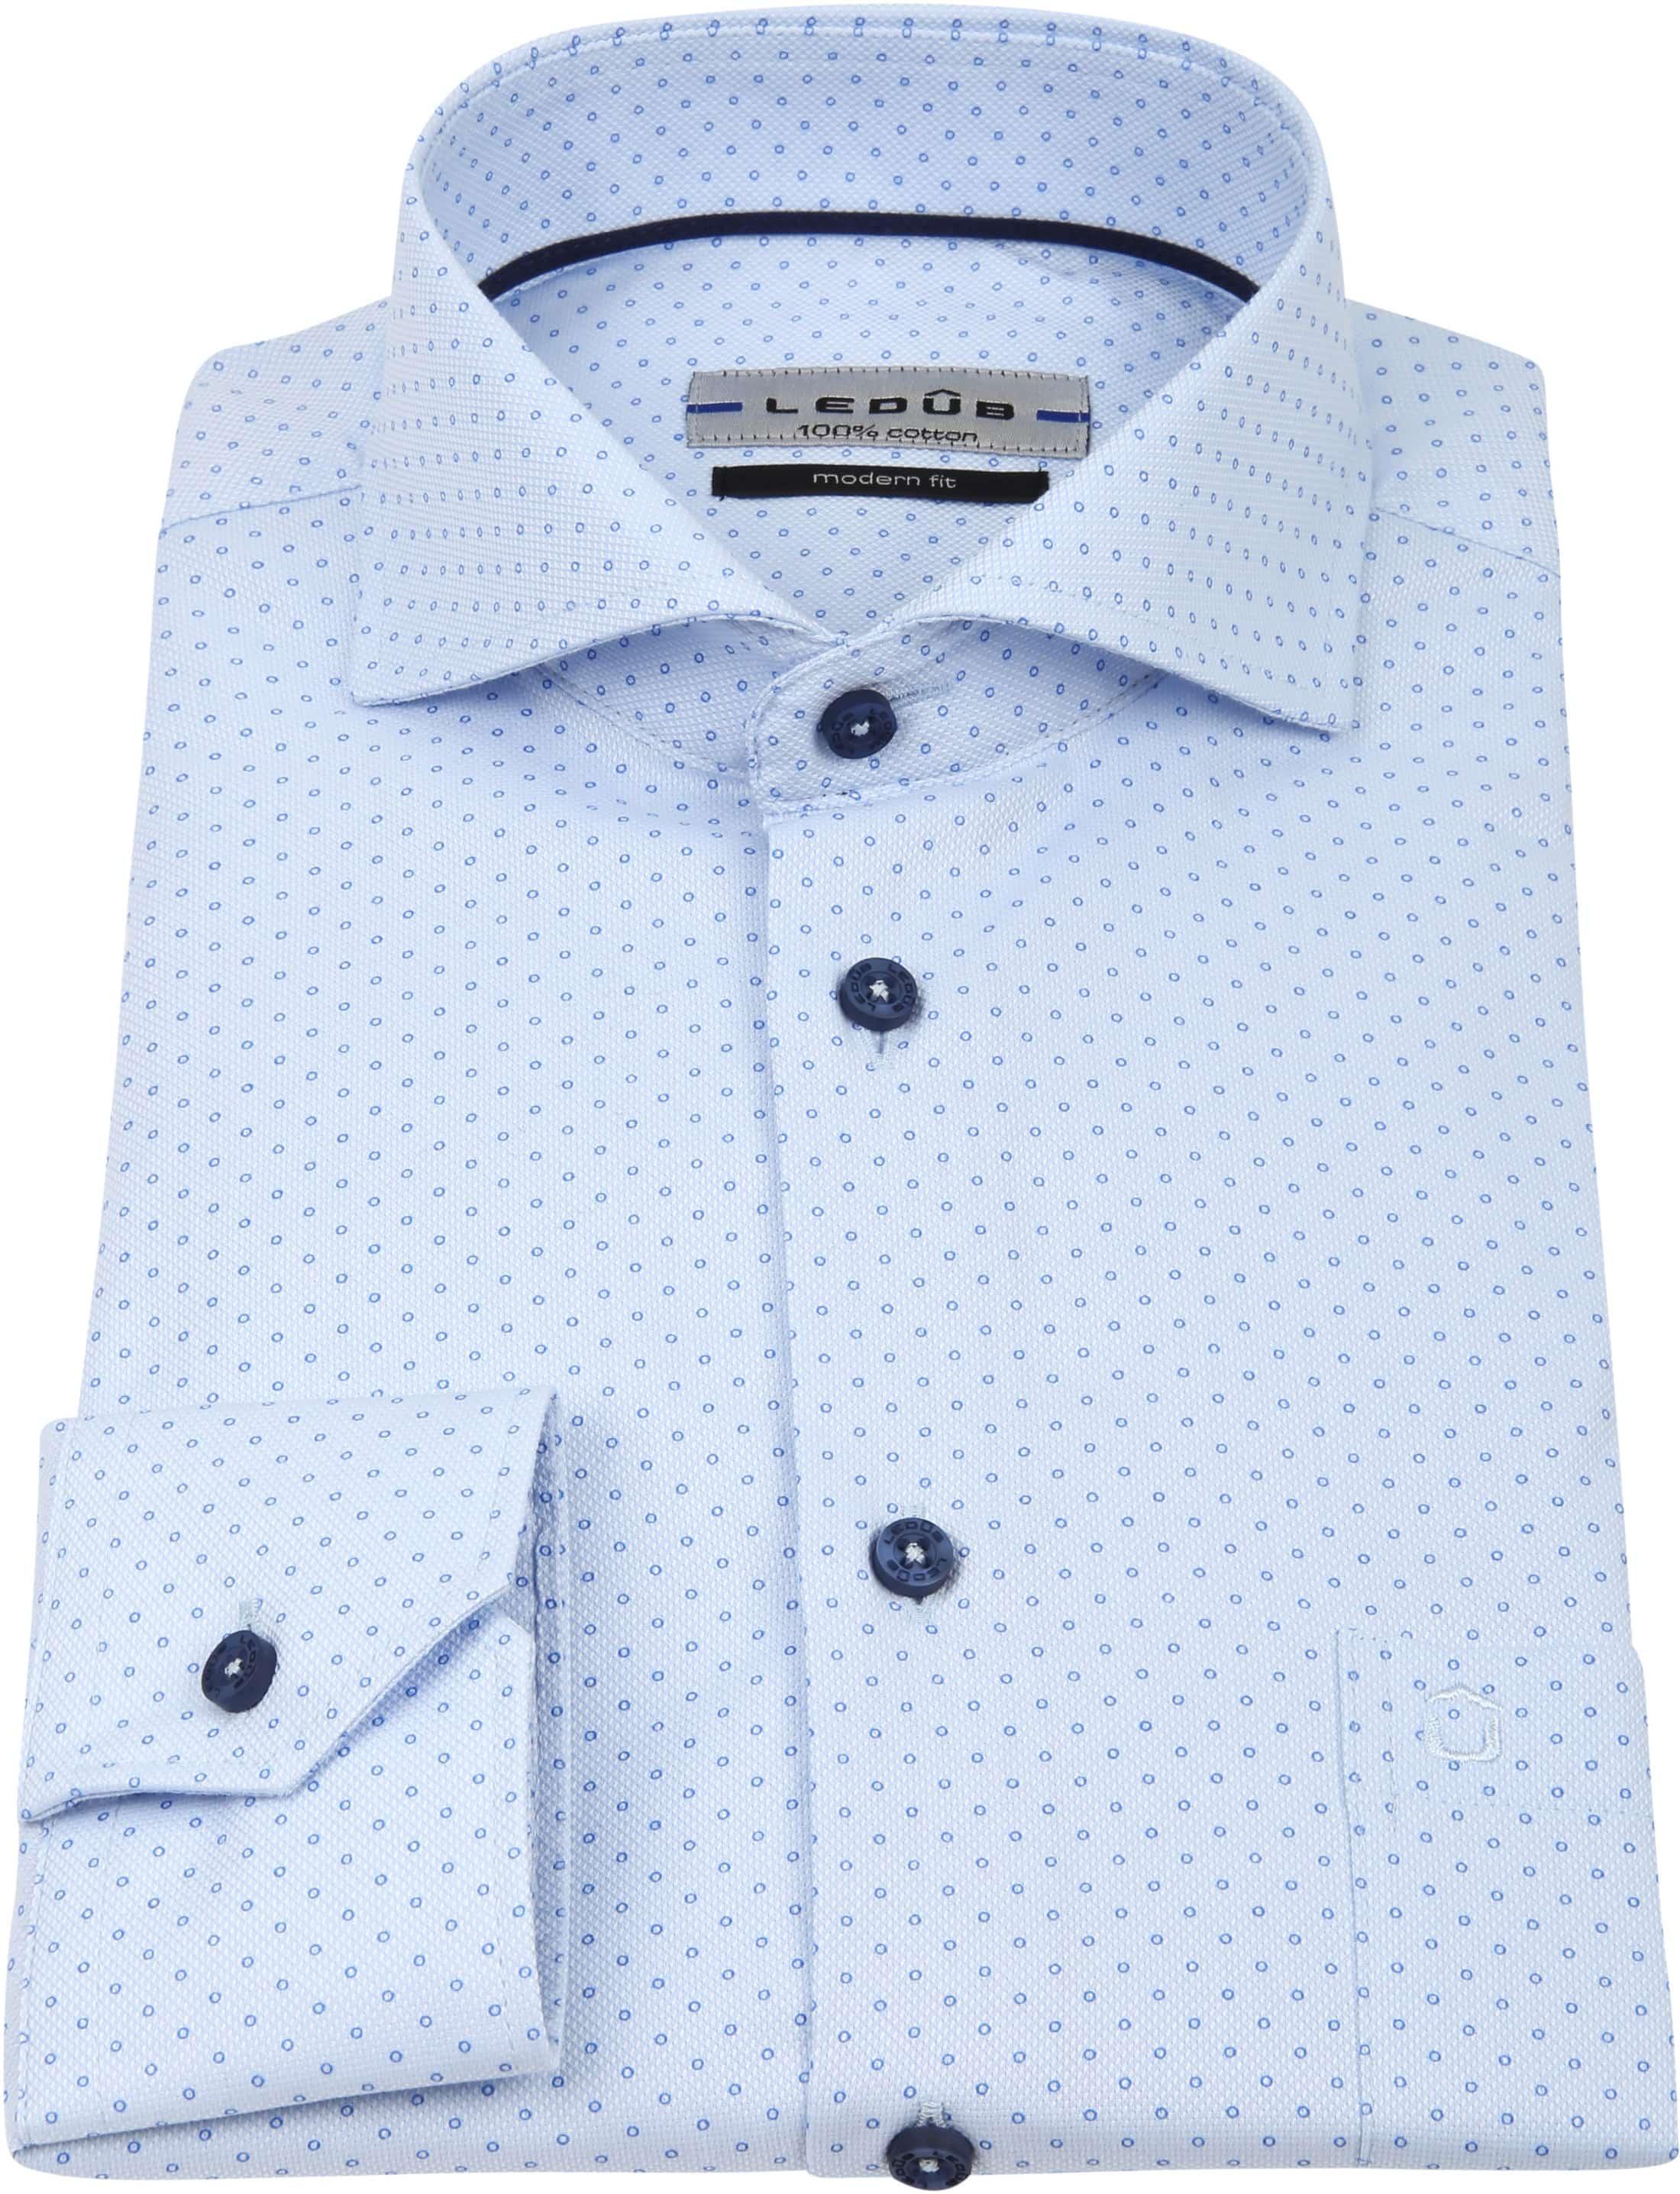 Ledub Overhemd MF Cirkel Blauw foto 3